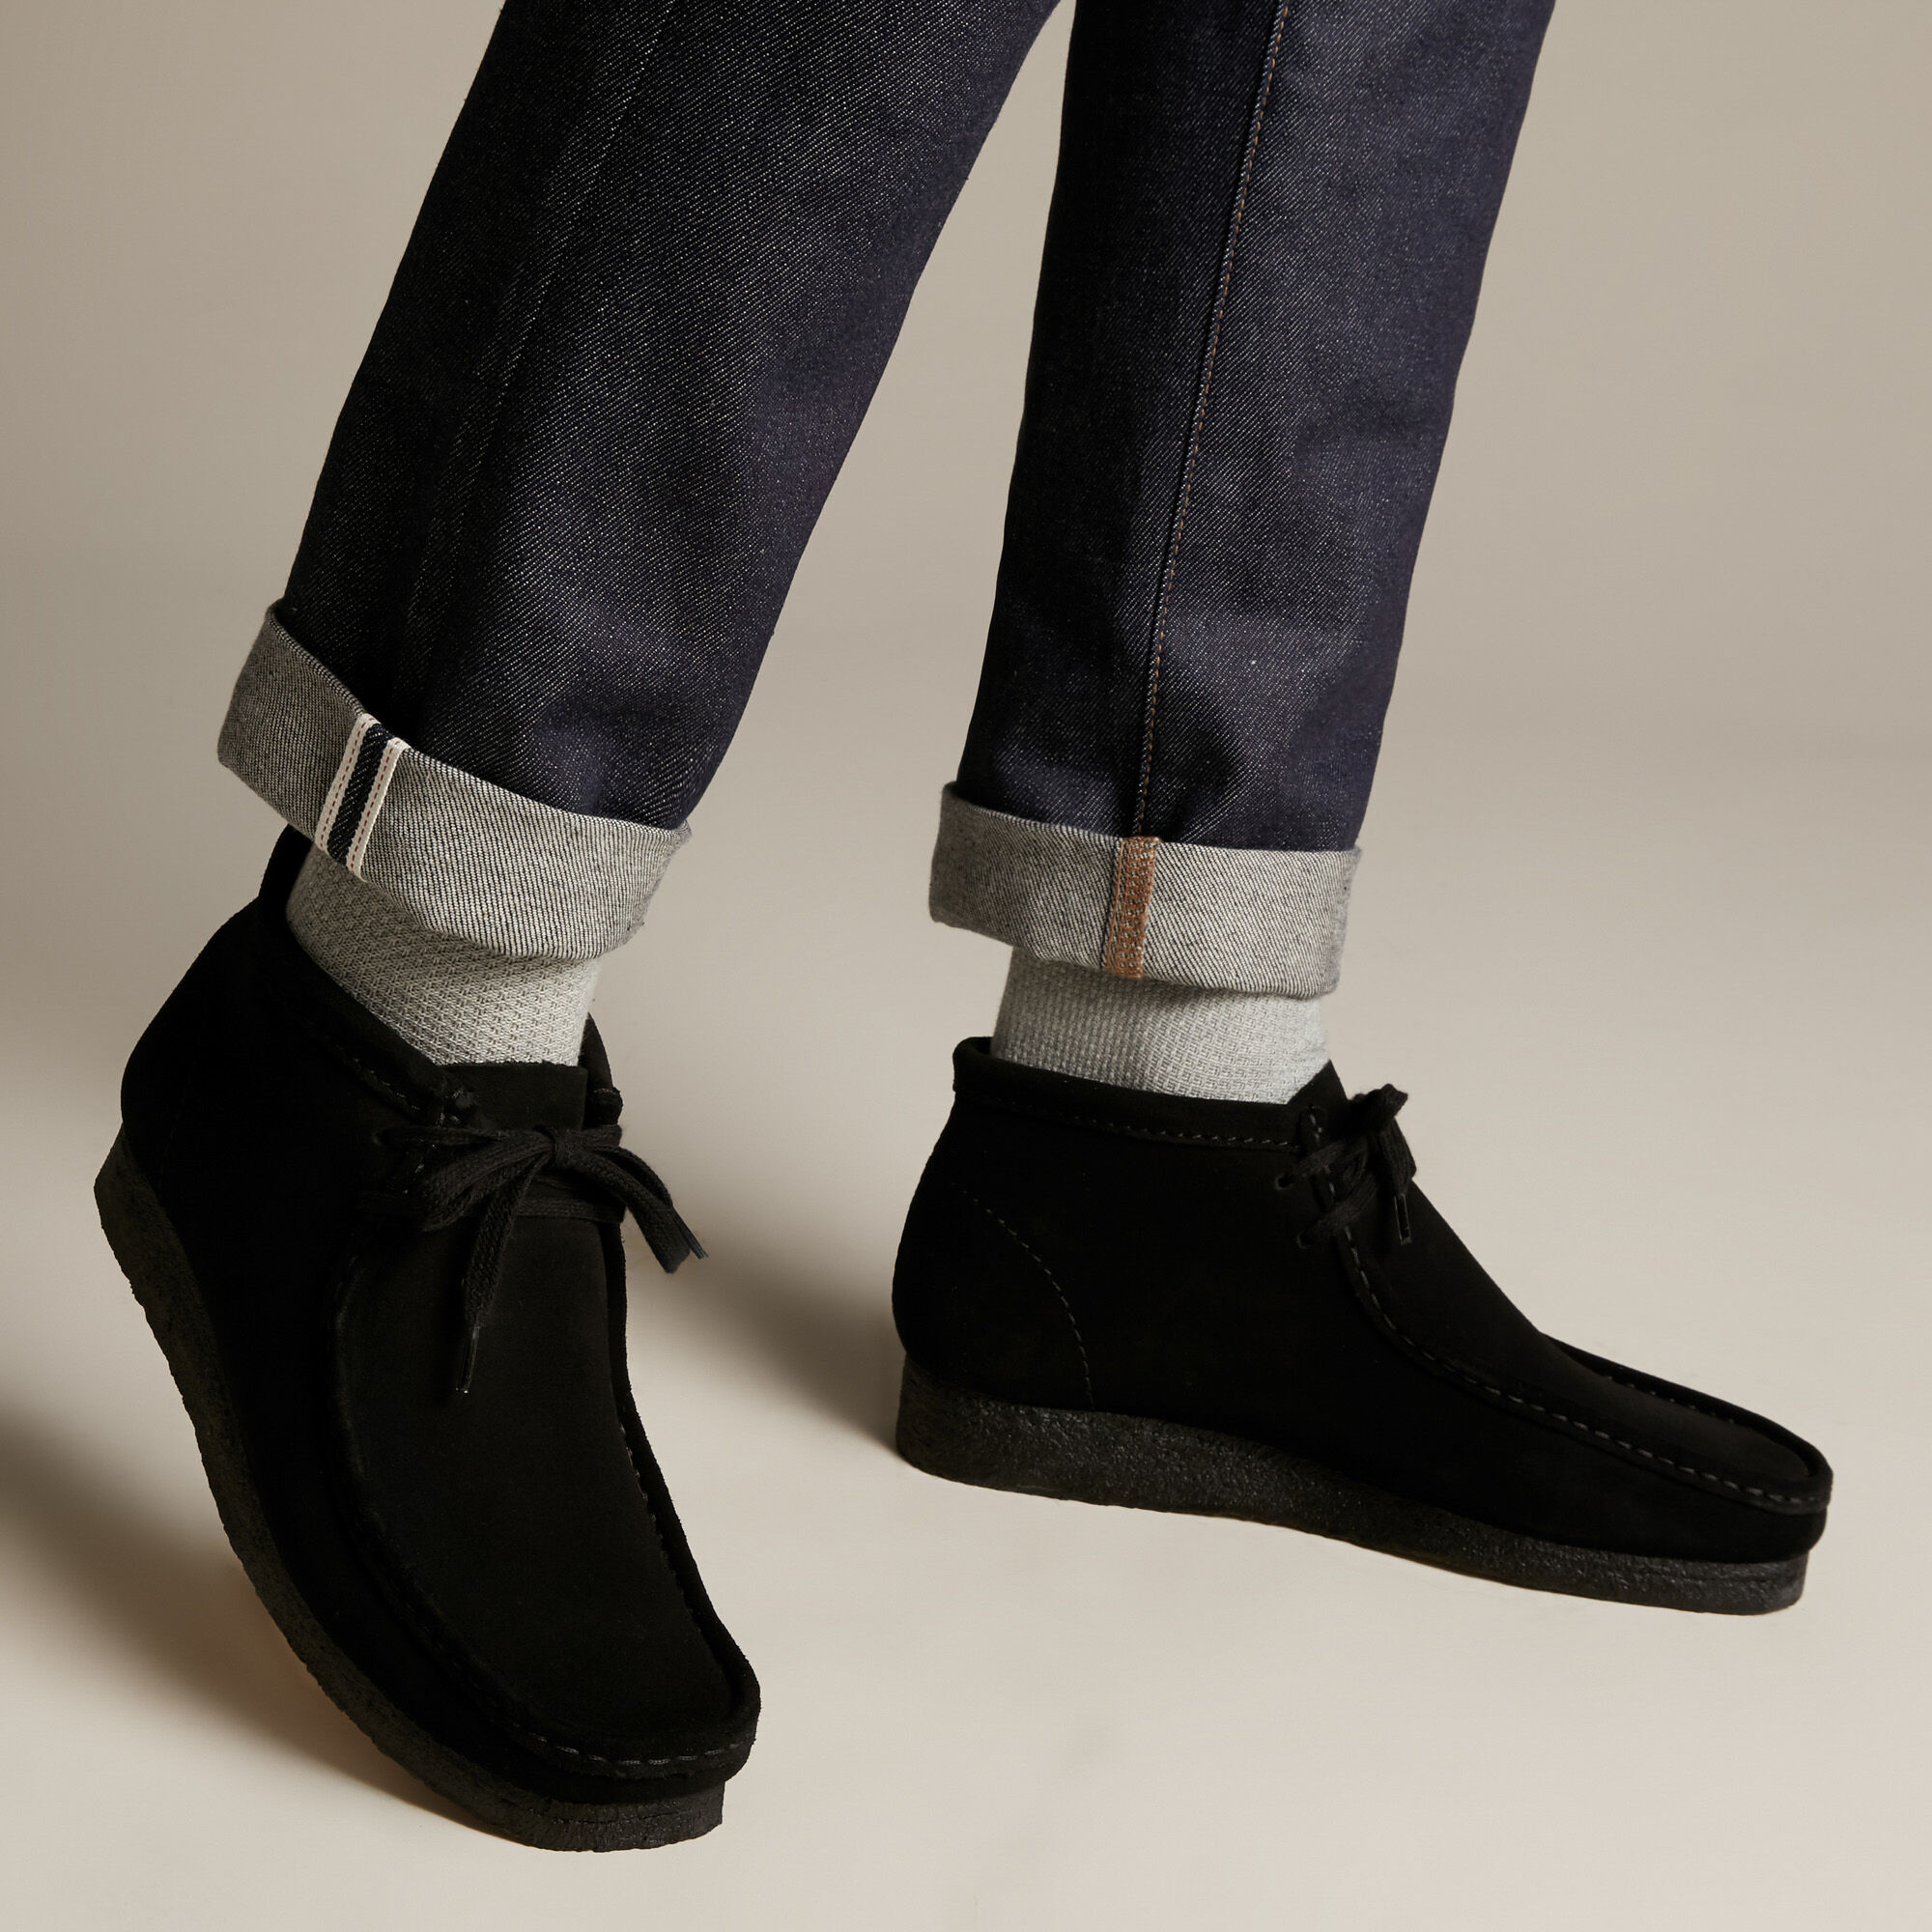 Men's Black Suede Ankle Boots